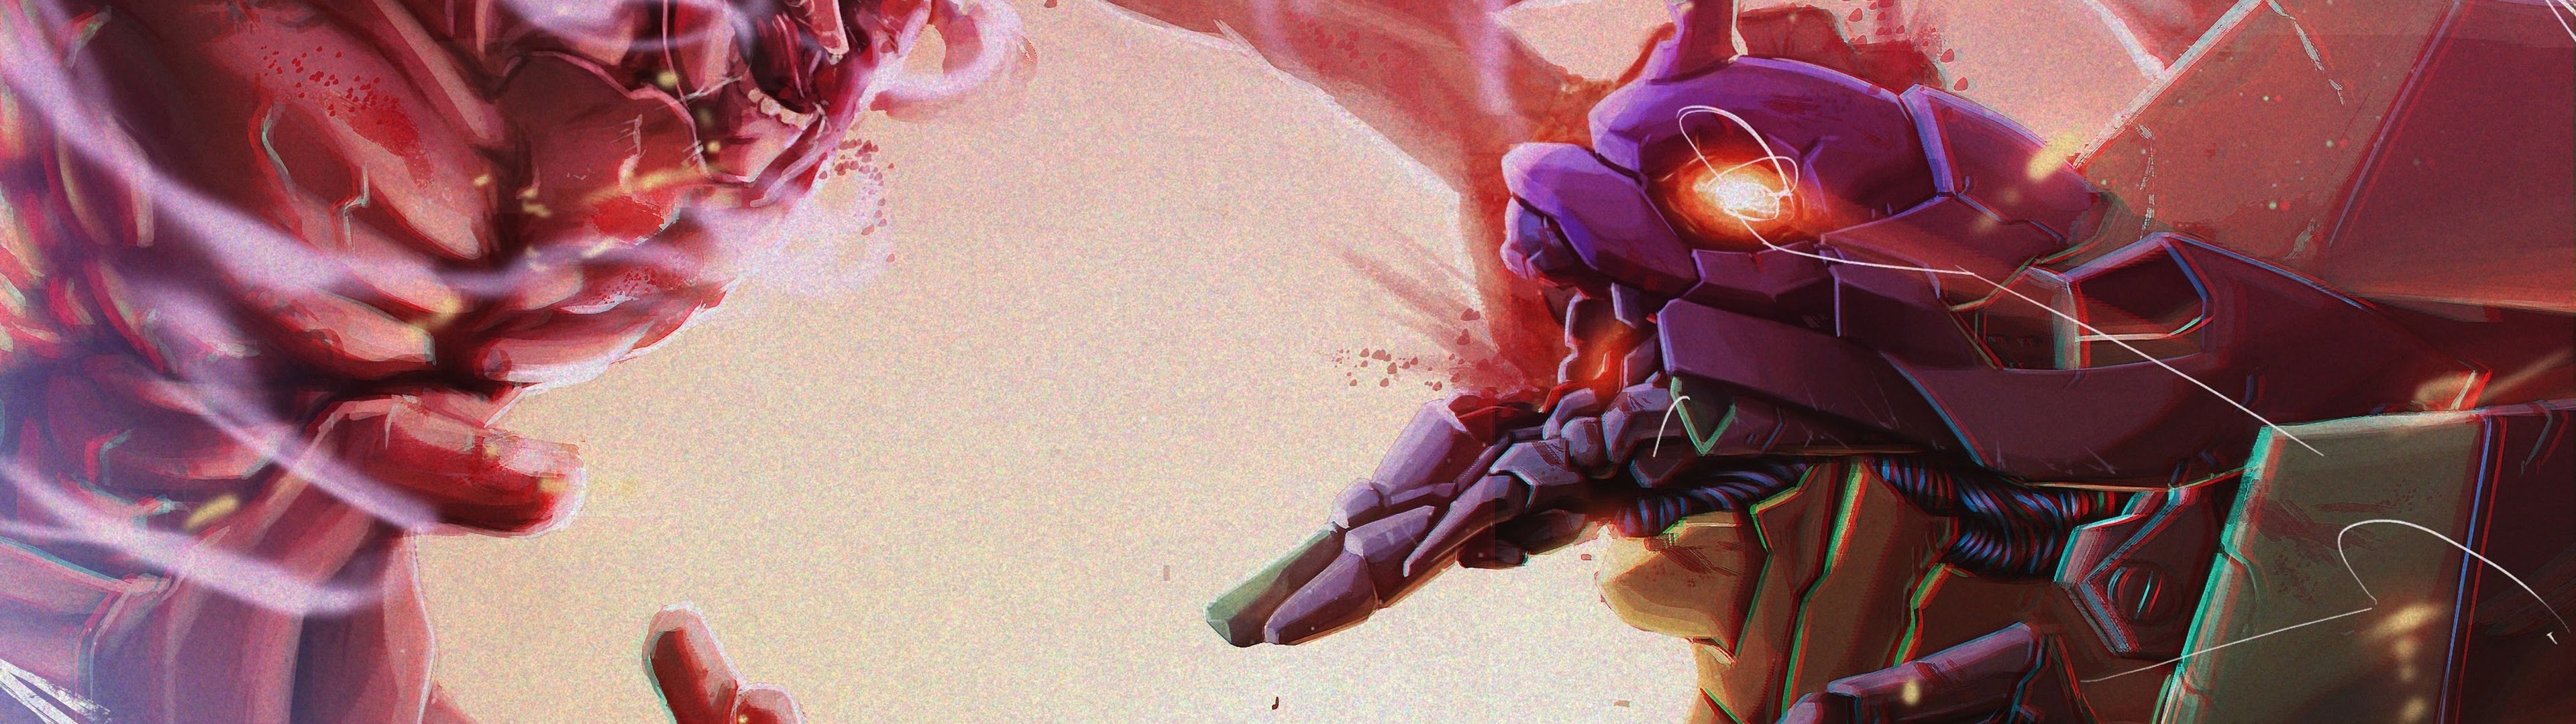 Attack Titan Vs Evangelion Attack On Titan 4k Wallpaper 49